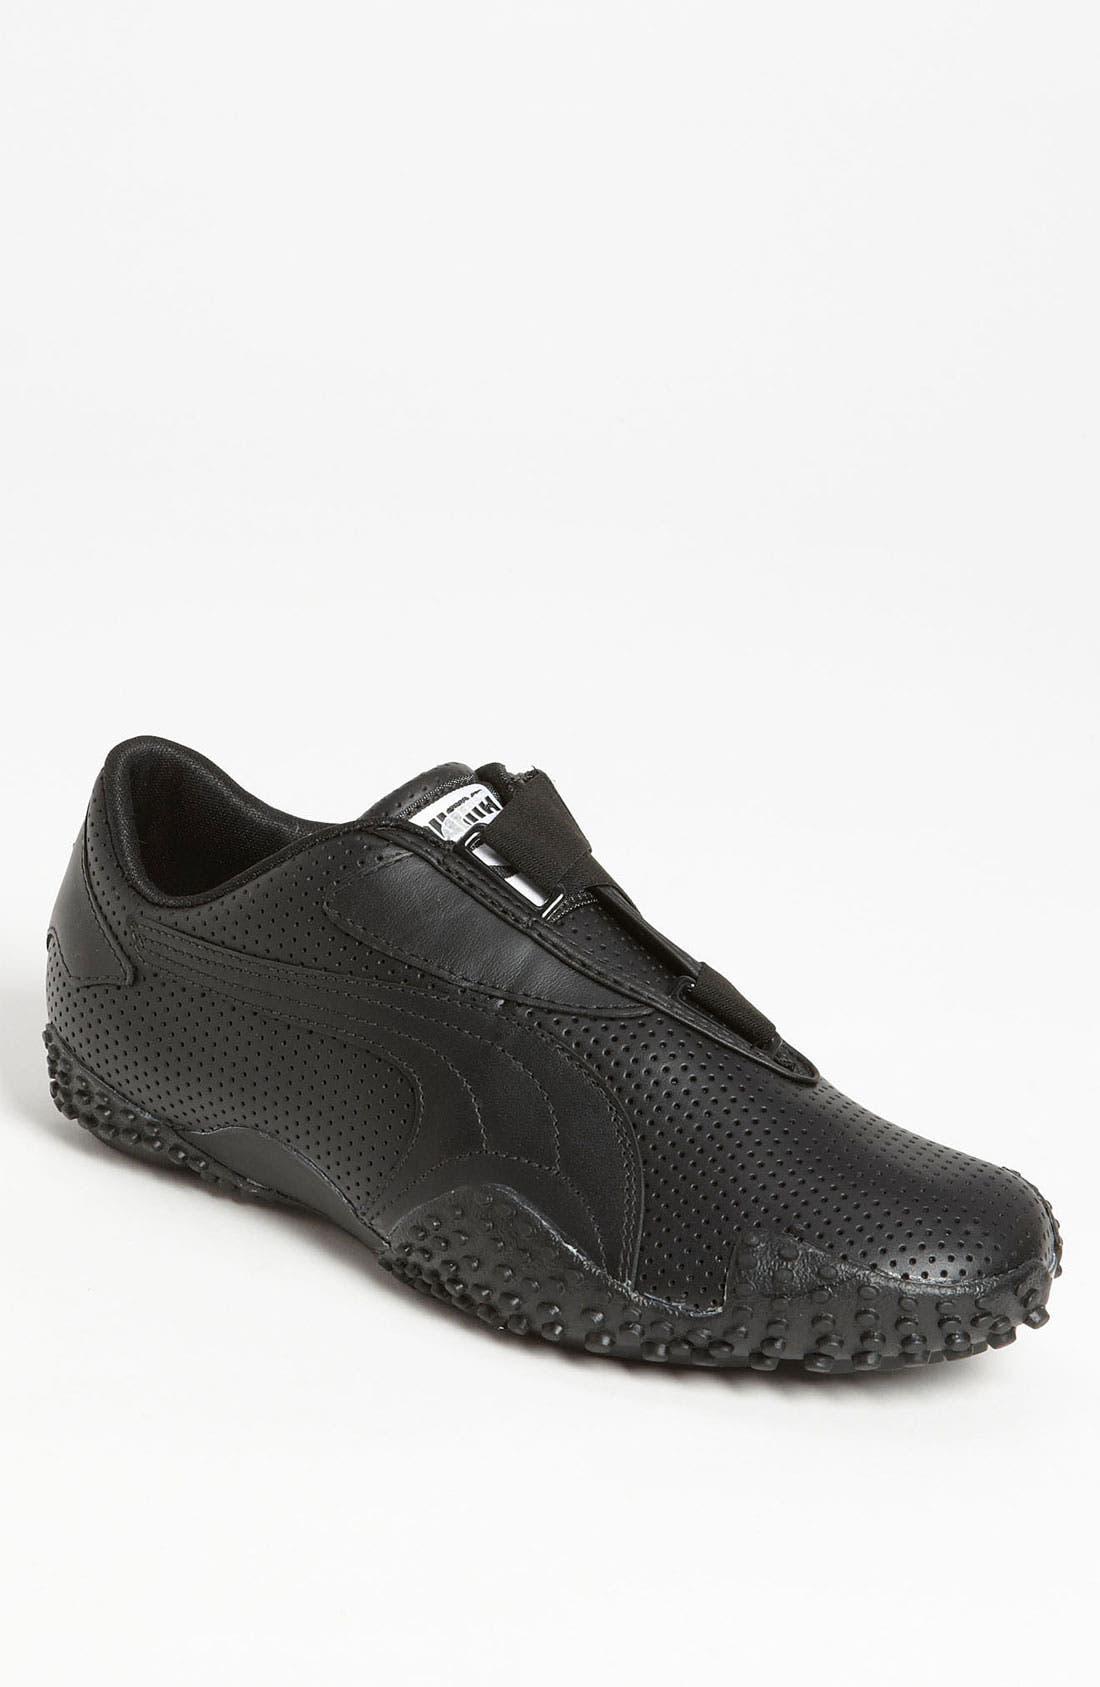 Main Image - PUMA 'Mostro' Sneaker (Men)